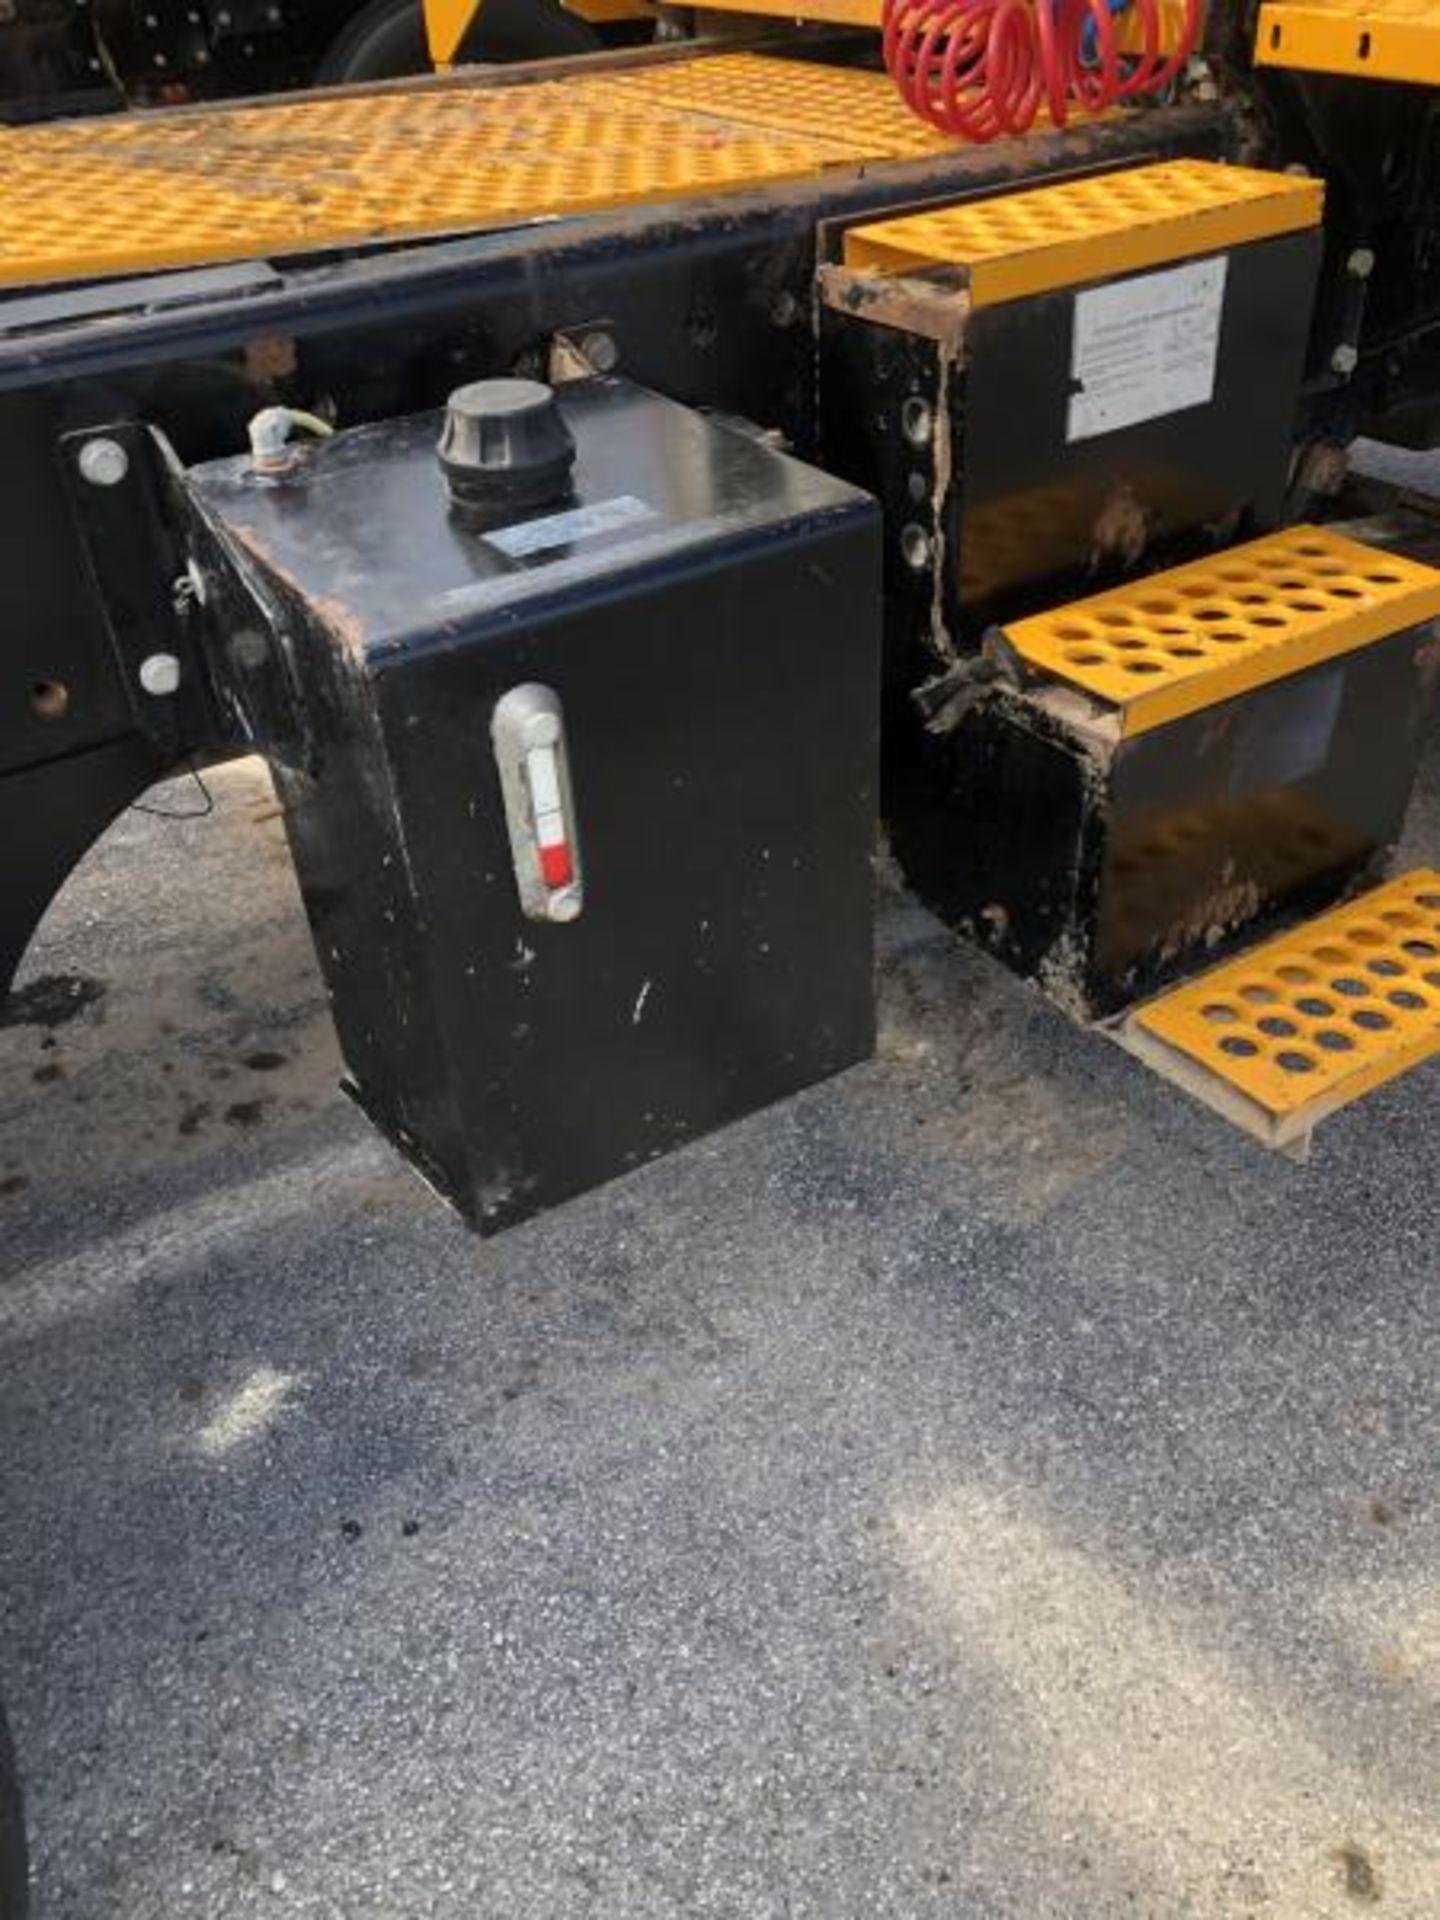 2015 Kalmar Ottawa 4x2 Yard Truck , SN: 338841 4,267.2 Hours, 1,683 Miles - Image 14 of 34